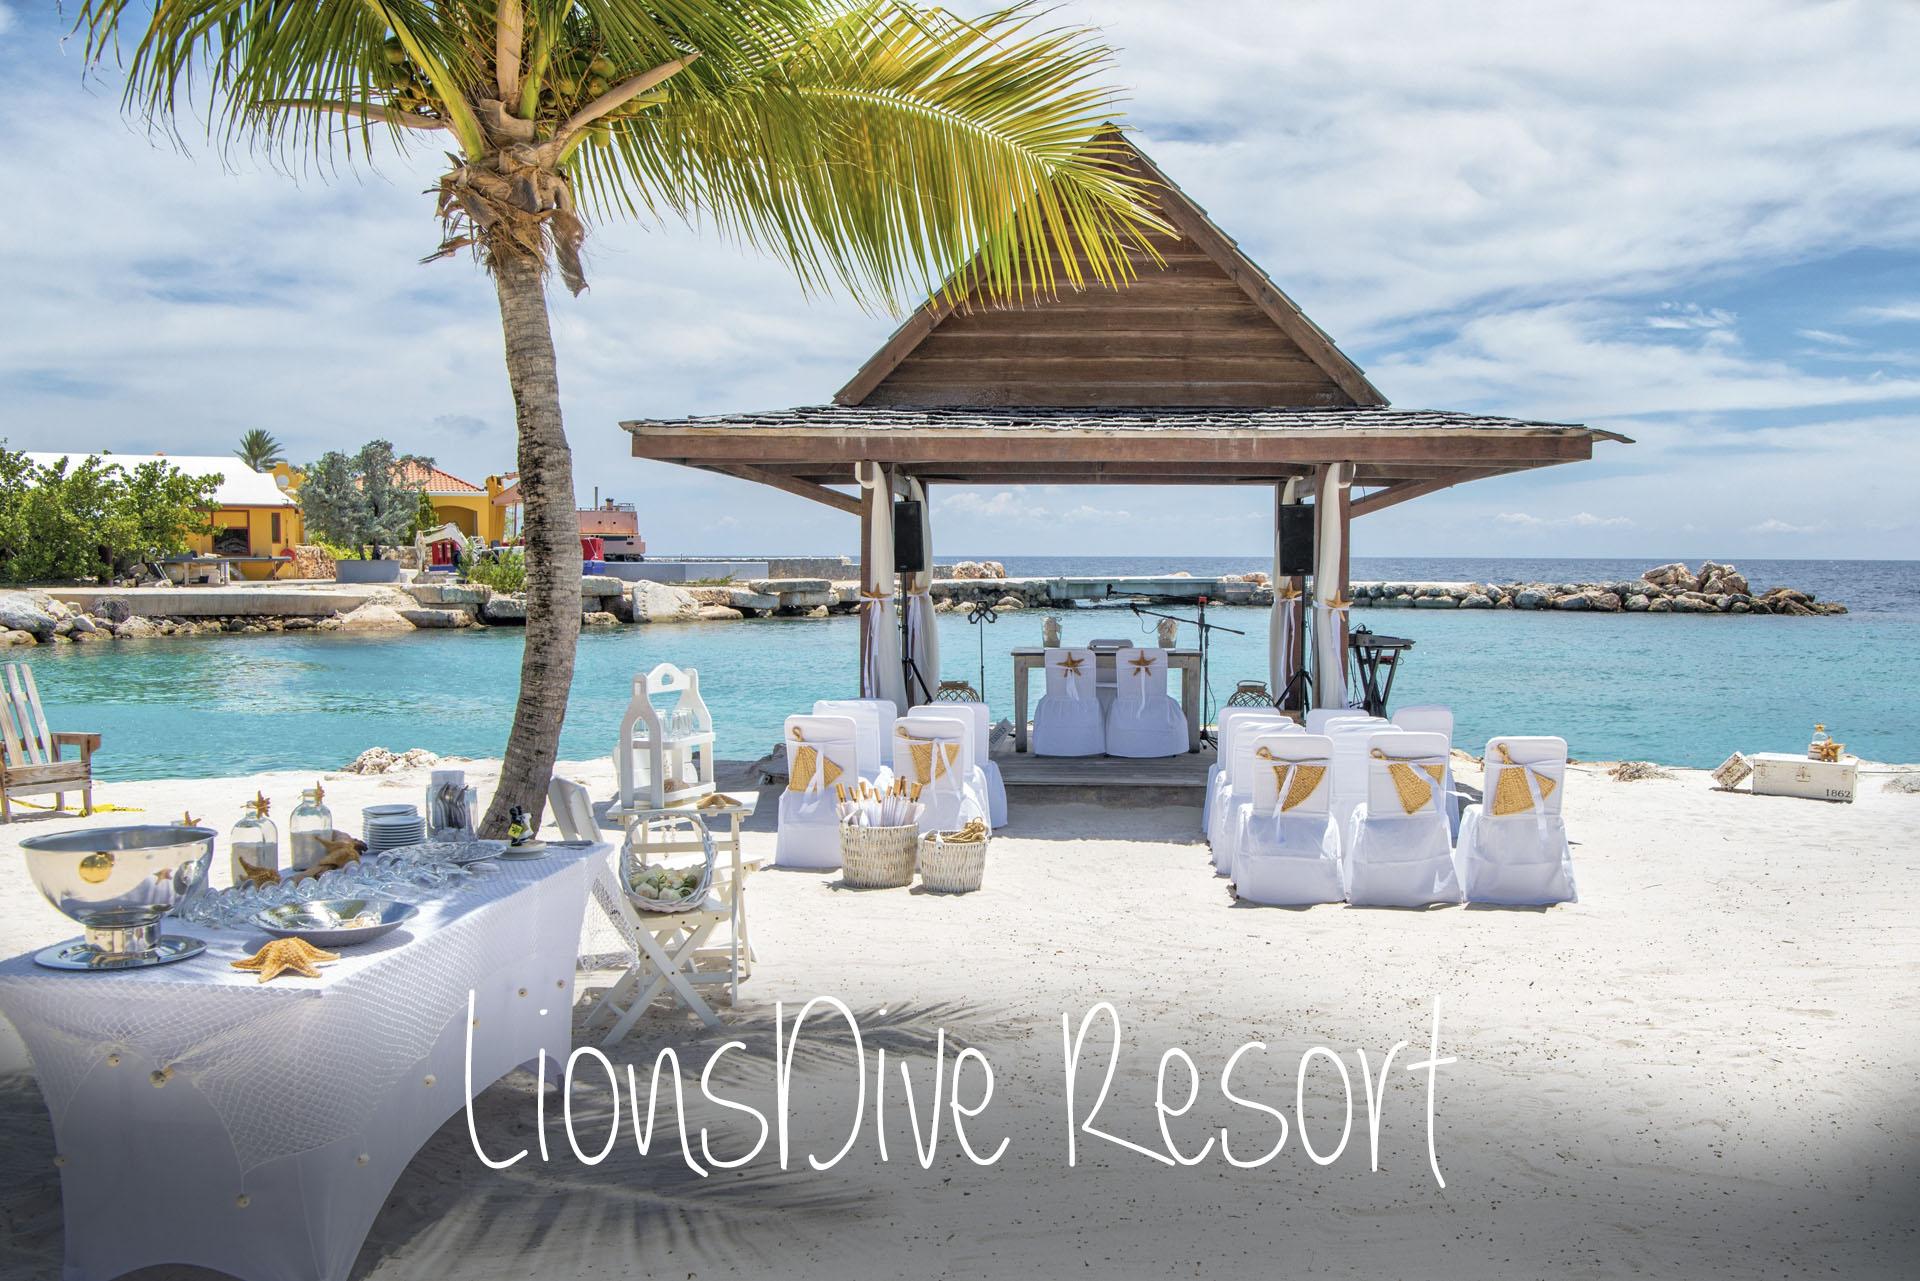 LionsDive Resort